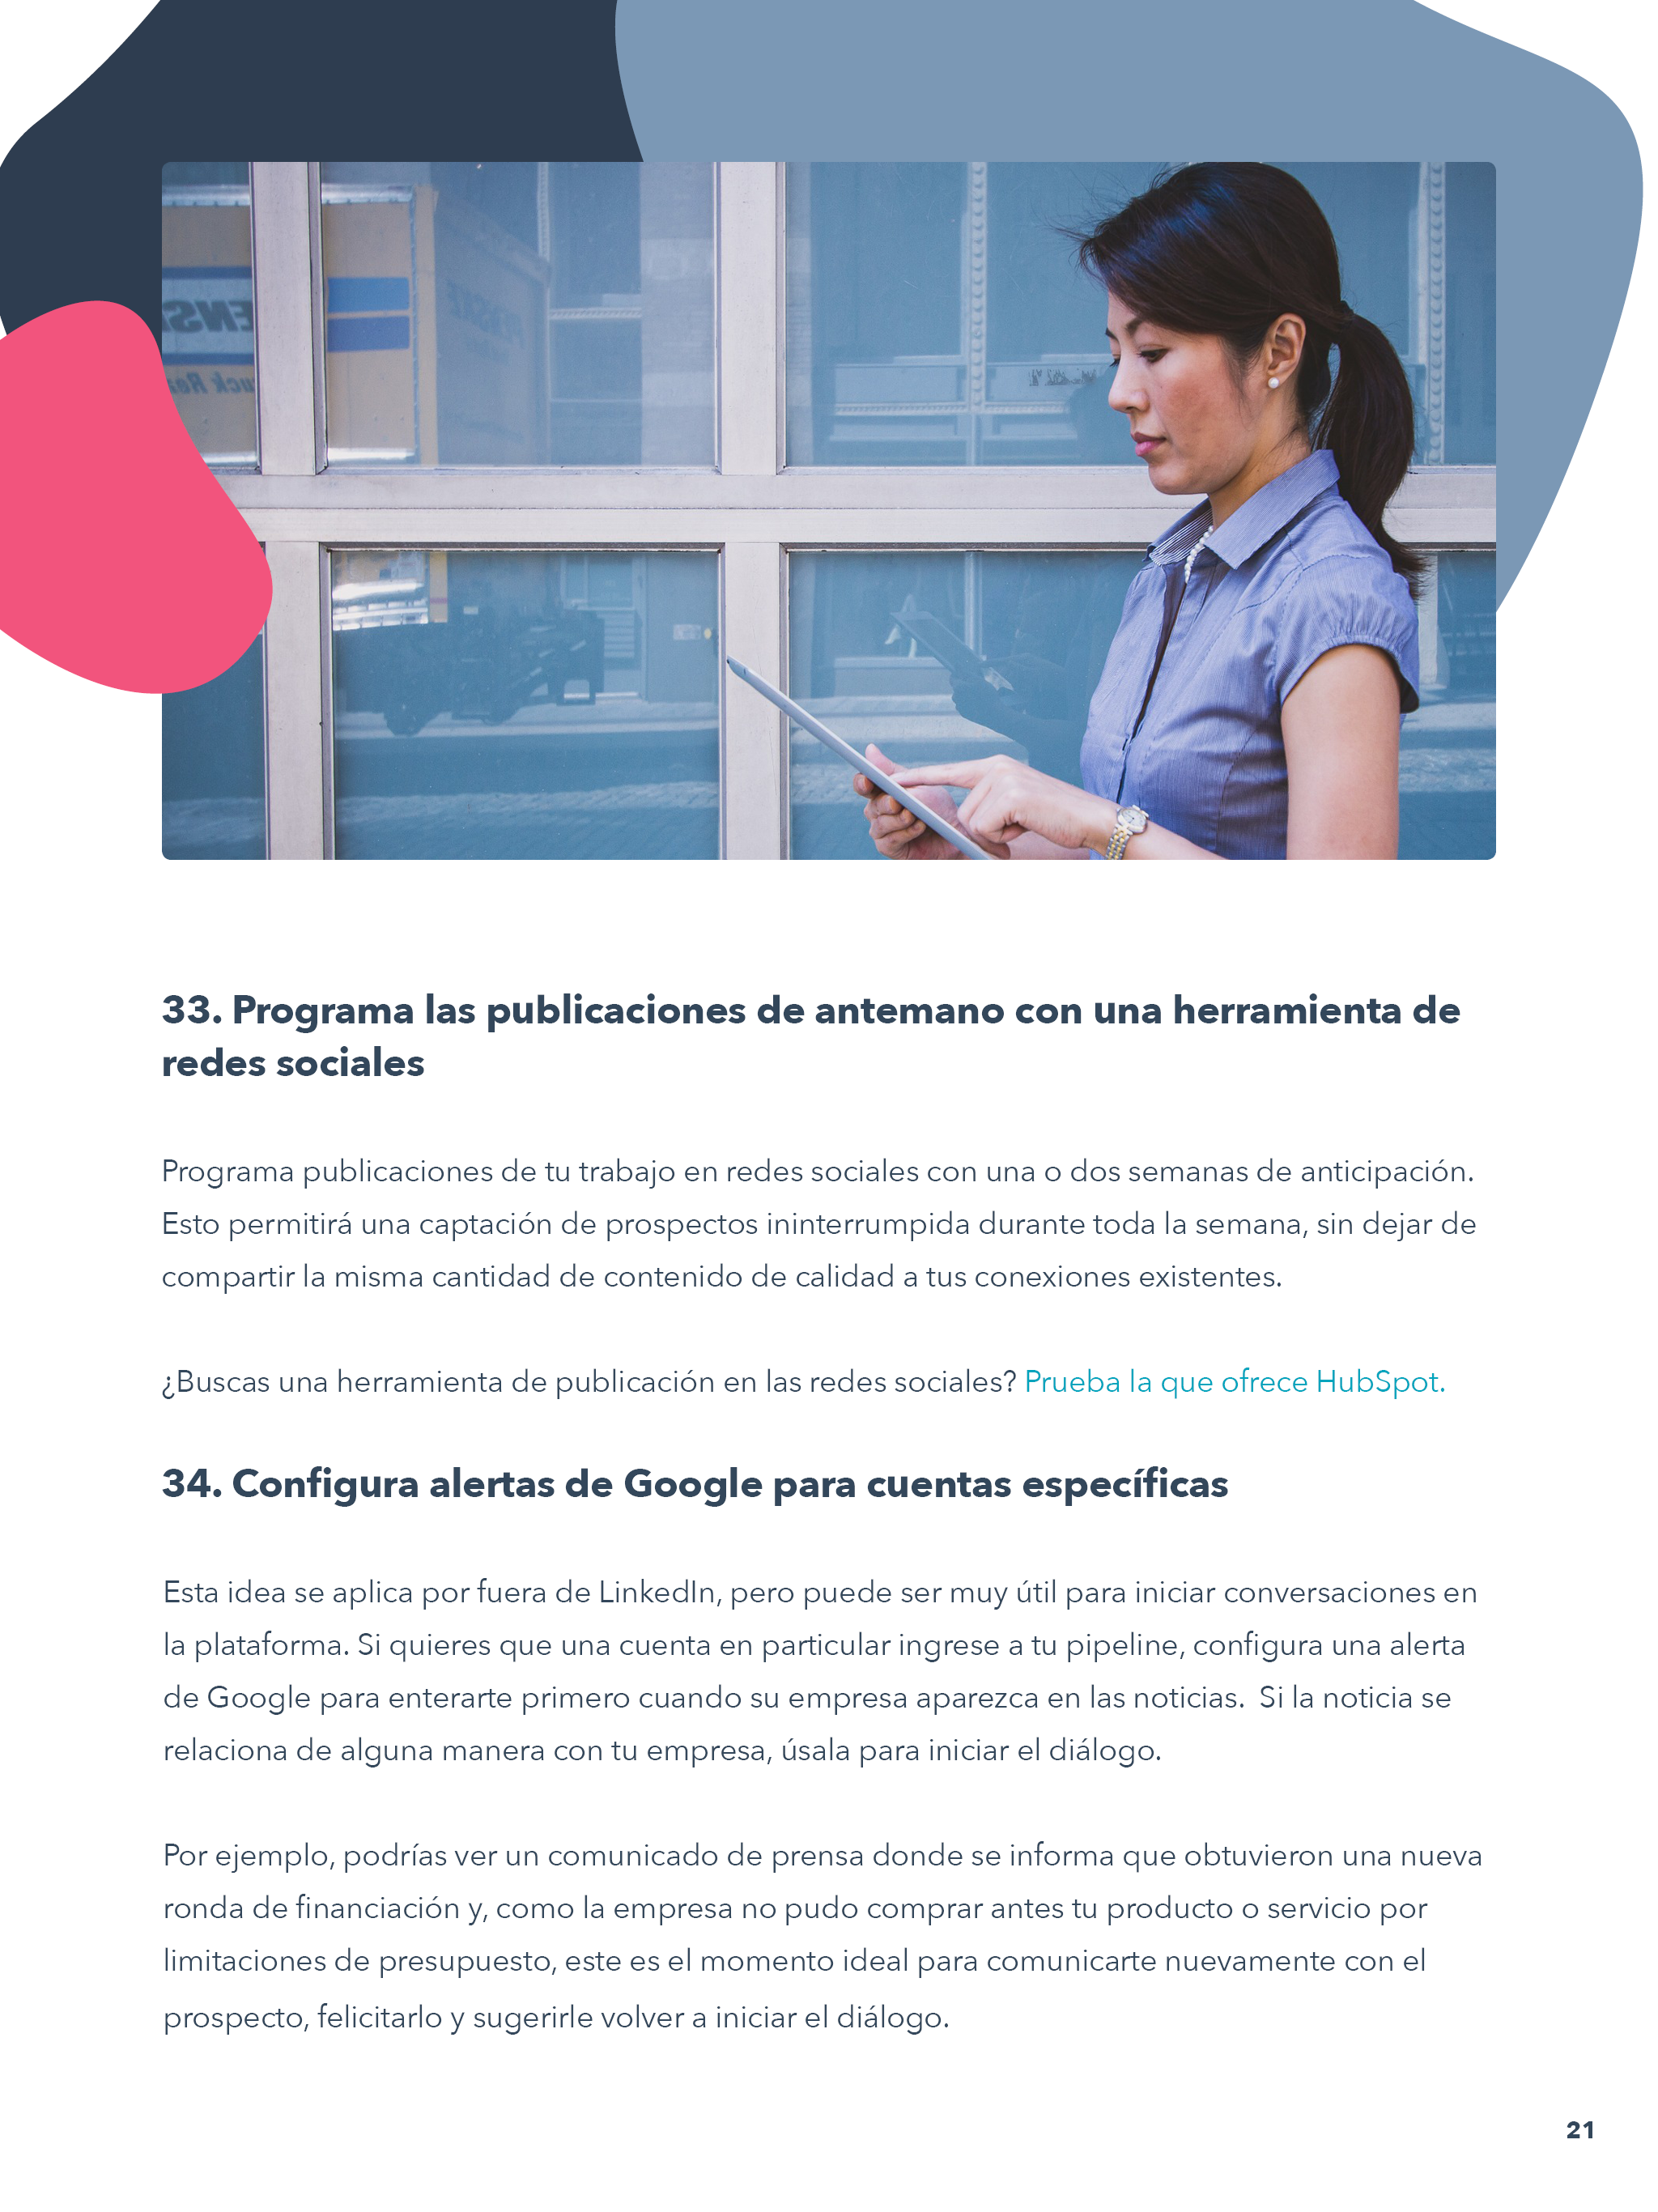 Guía LinkedIn 3